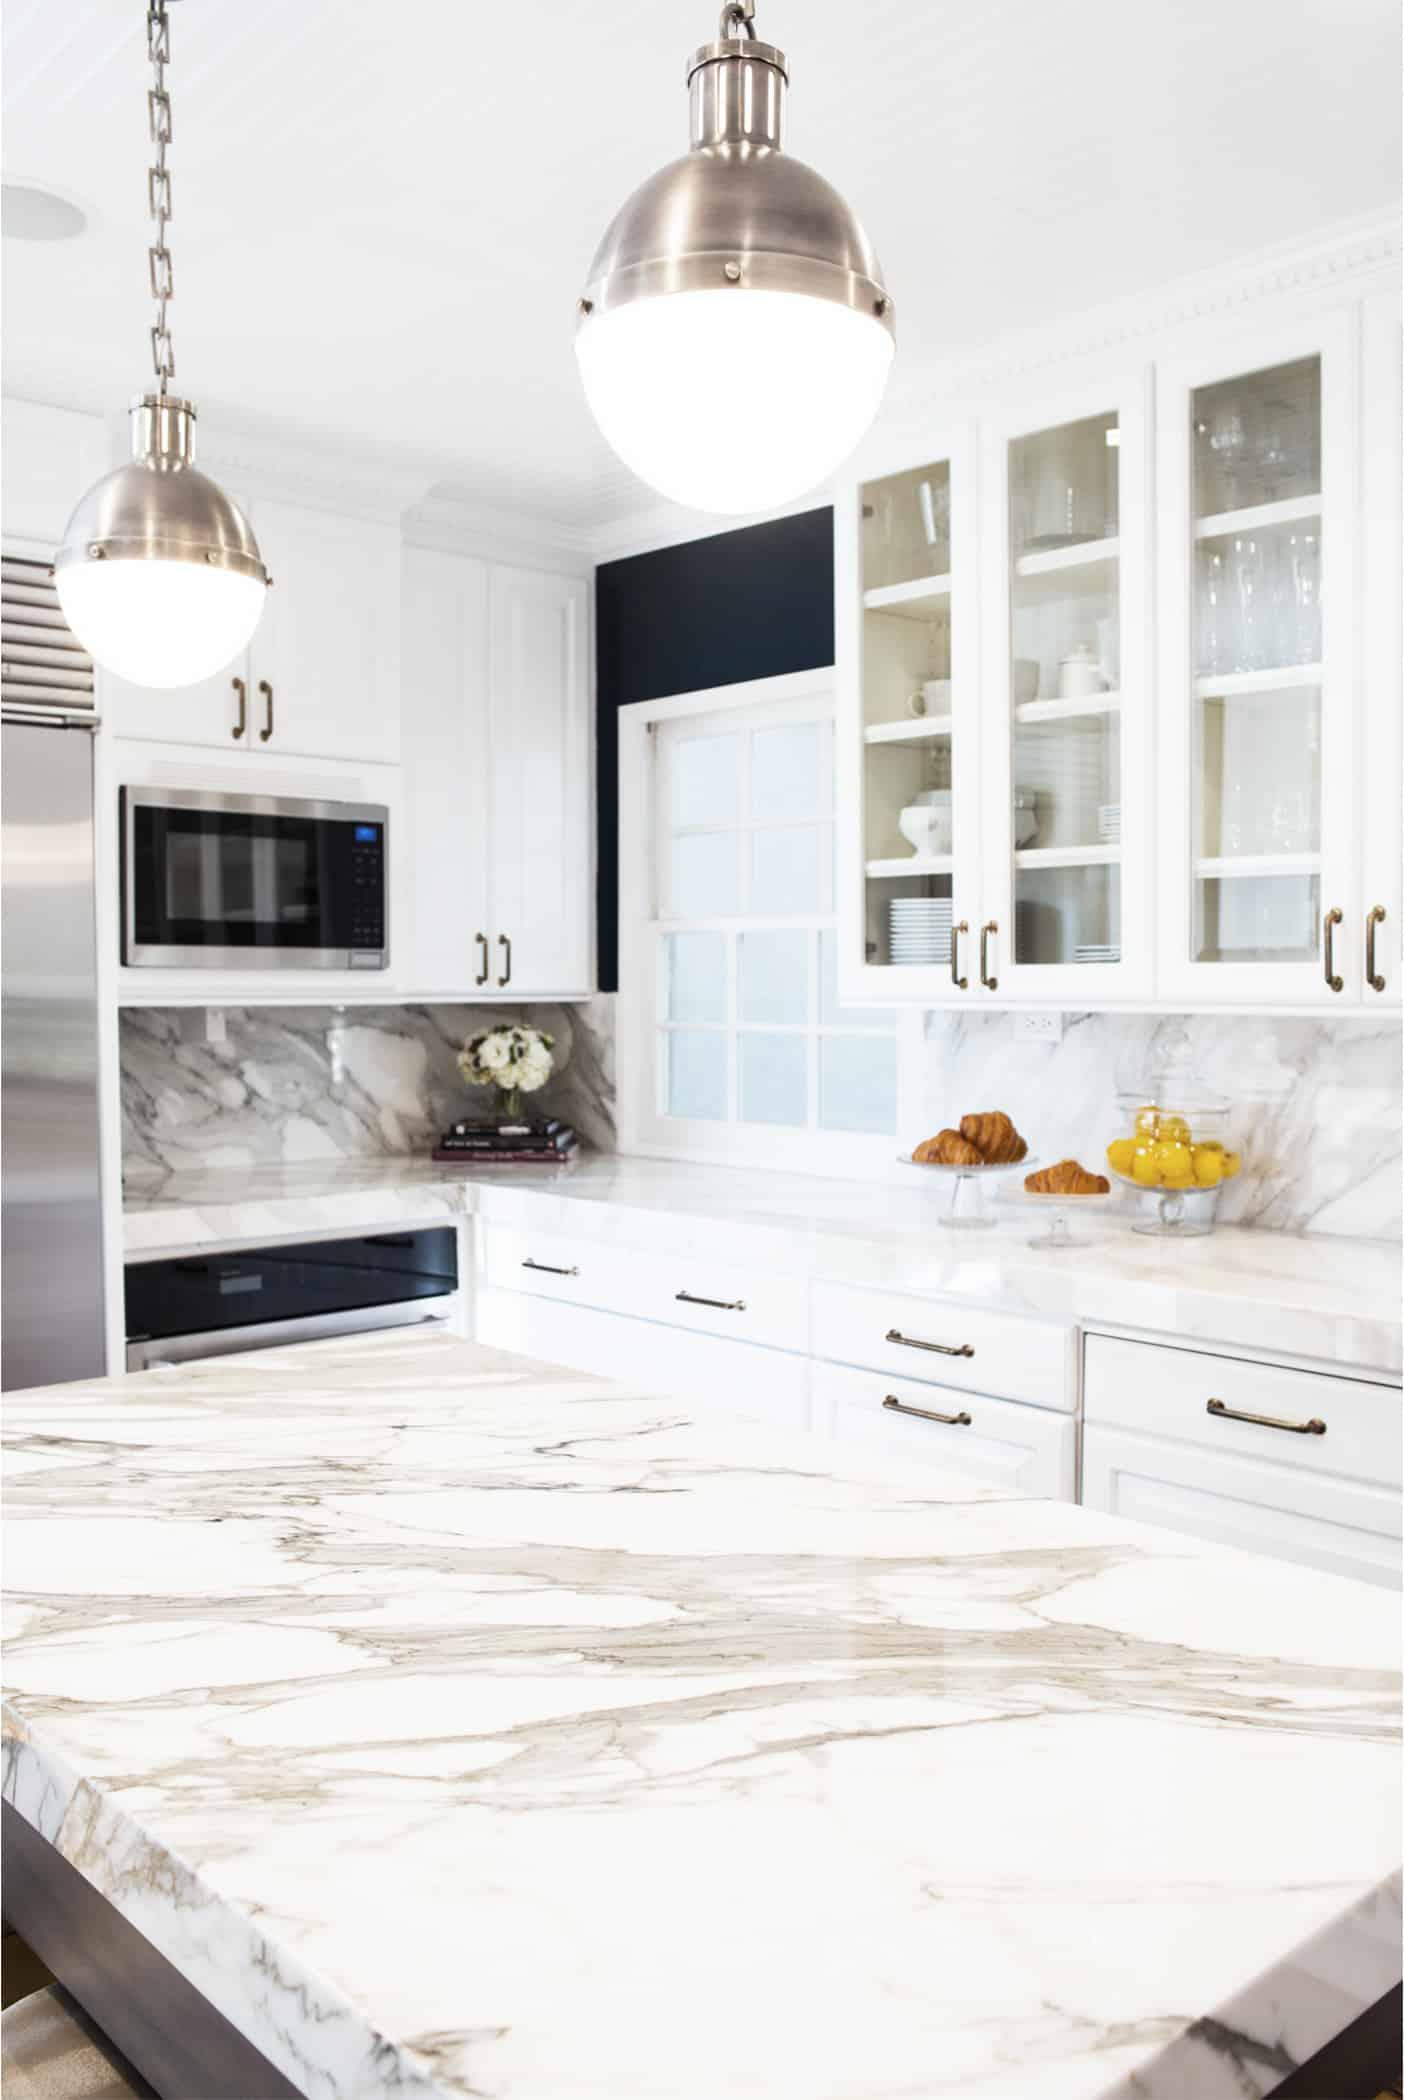 Designer Kitchen designer kitchen remodel budget details | cococozy